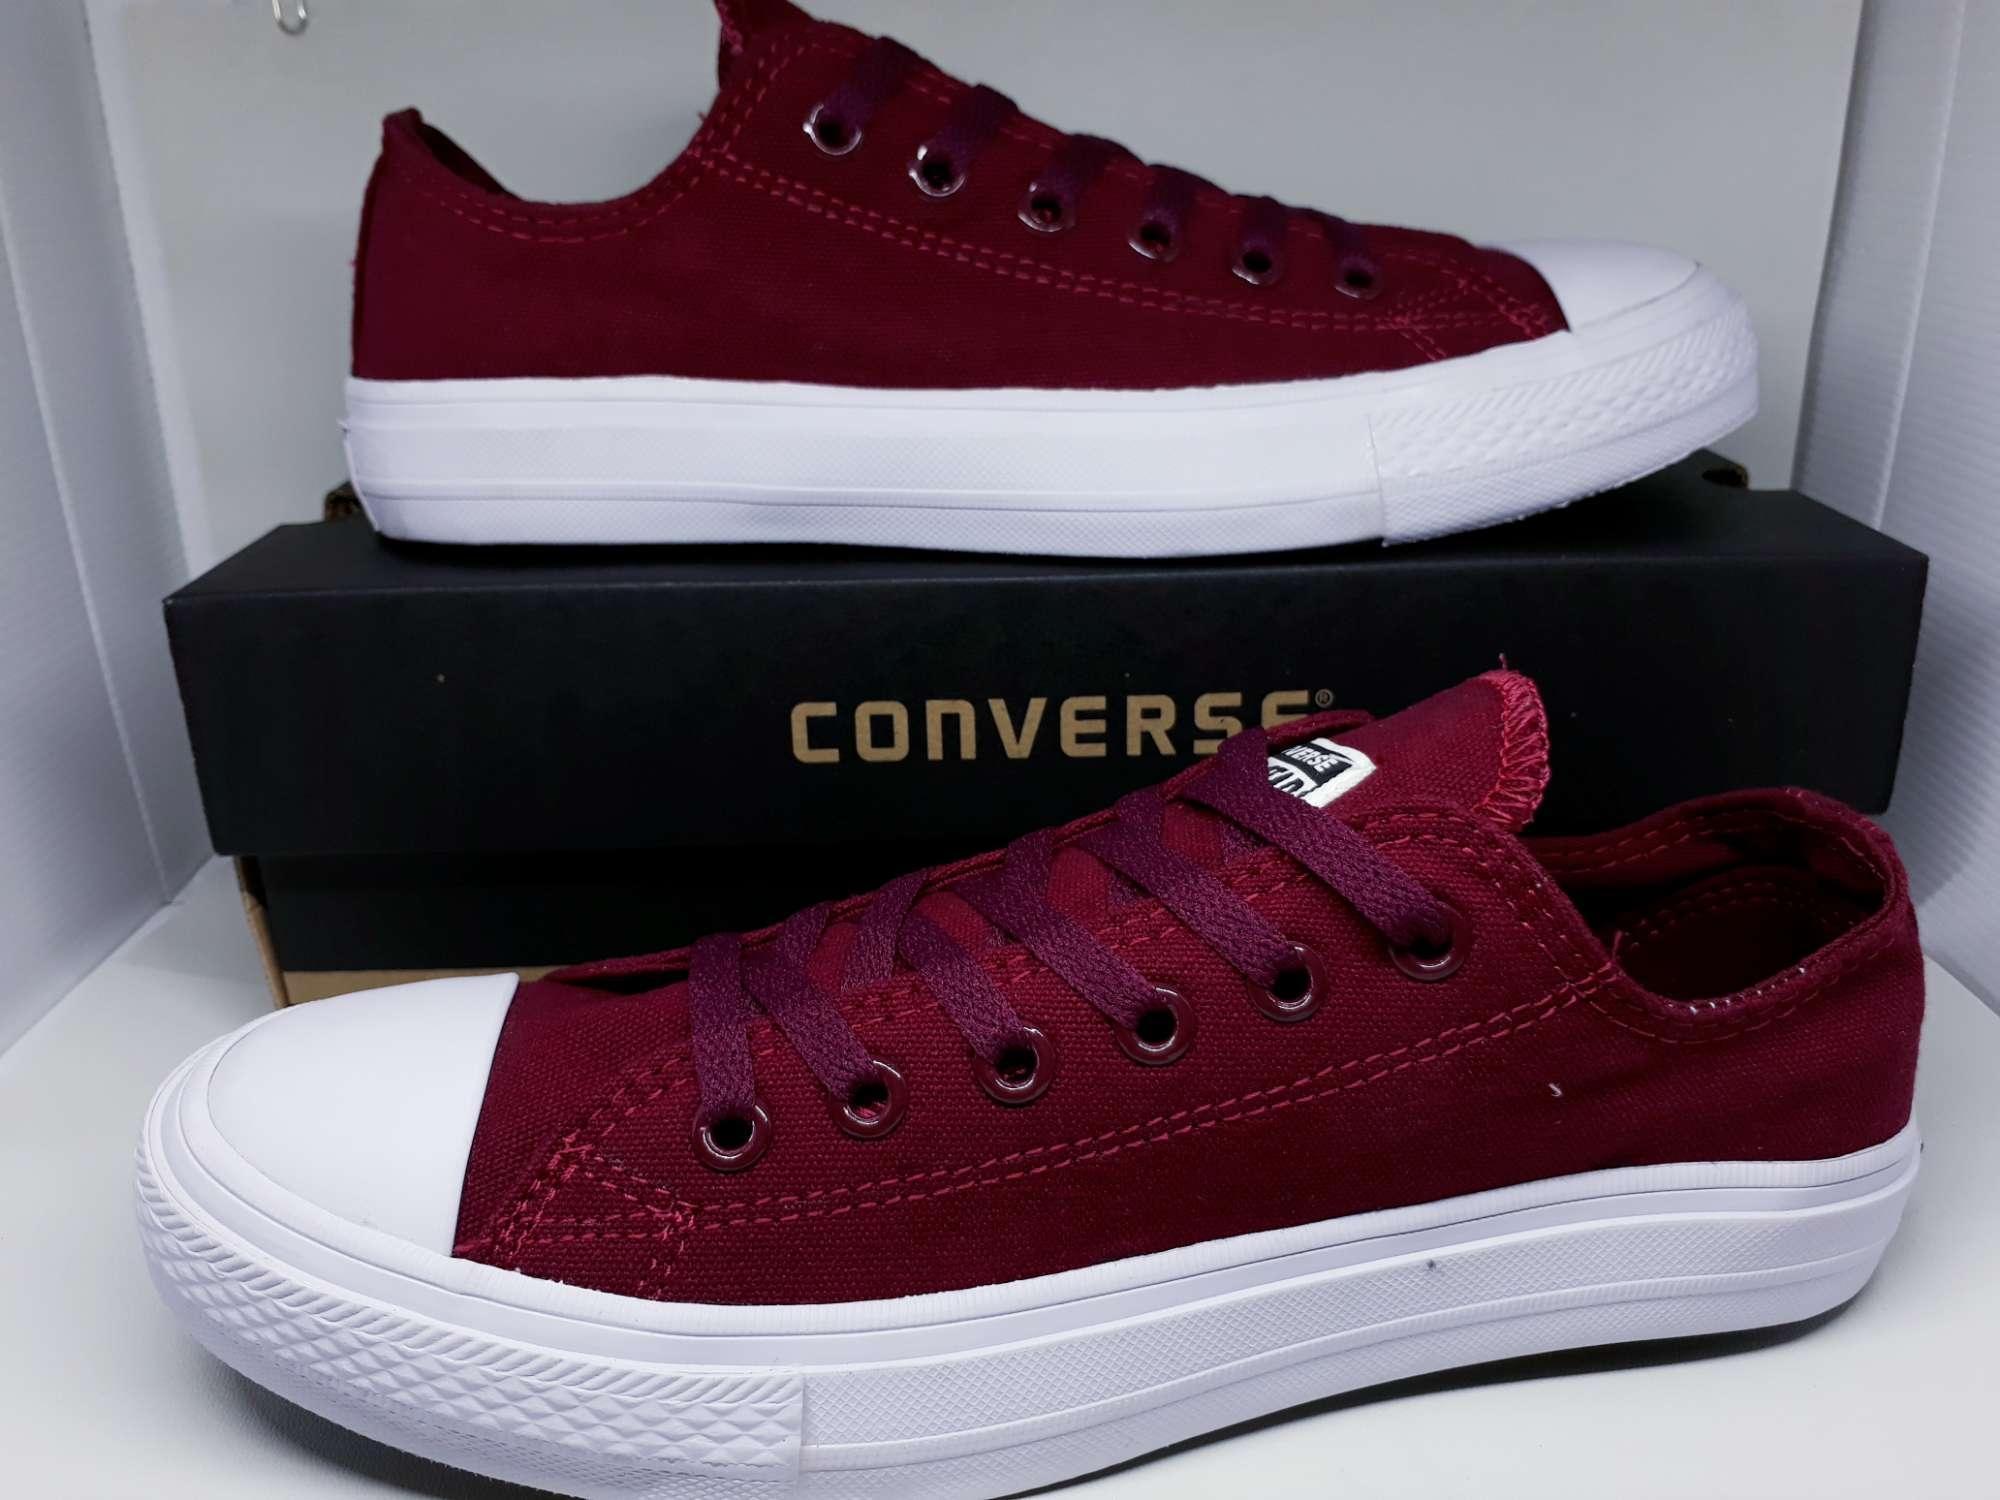 Sepatu Pantofel Termodis Murah Soeok Dr Kevin Men Formal Shoes 13199 Brown Cokelat Tua 41 Converse Chuck Taylor Ct All Star Retro Red Merah Marun